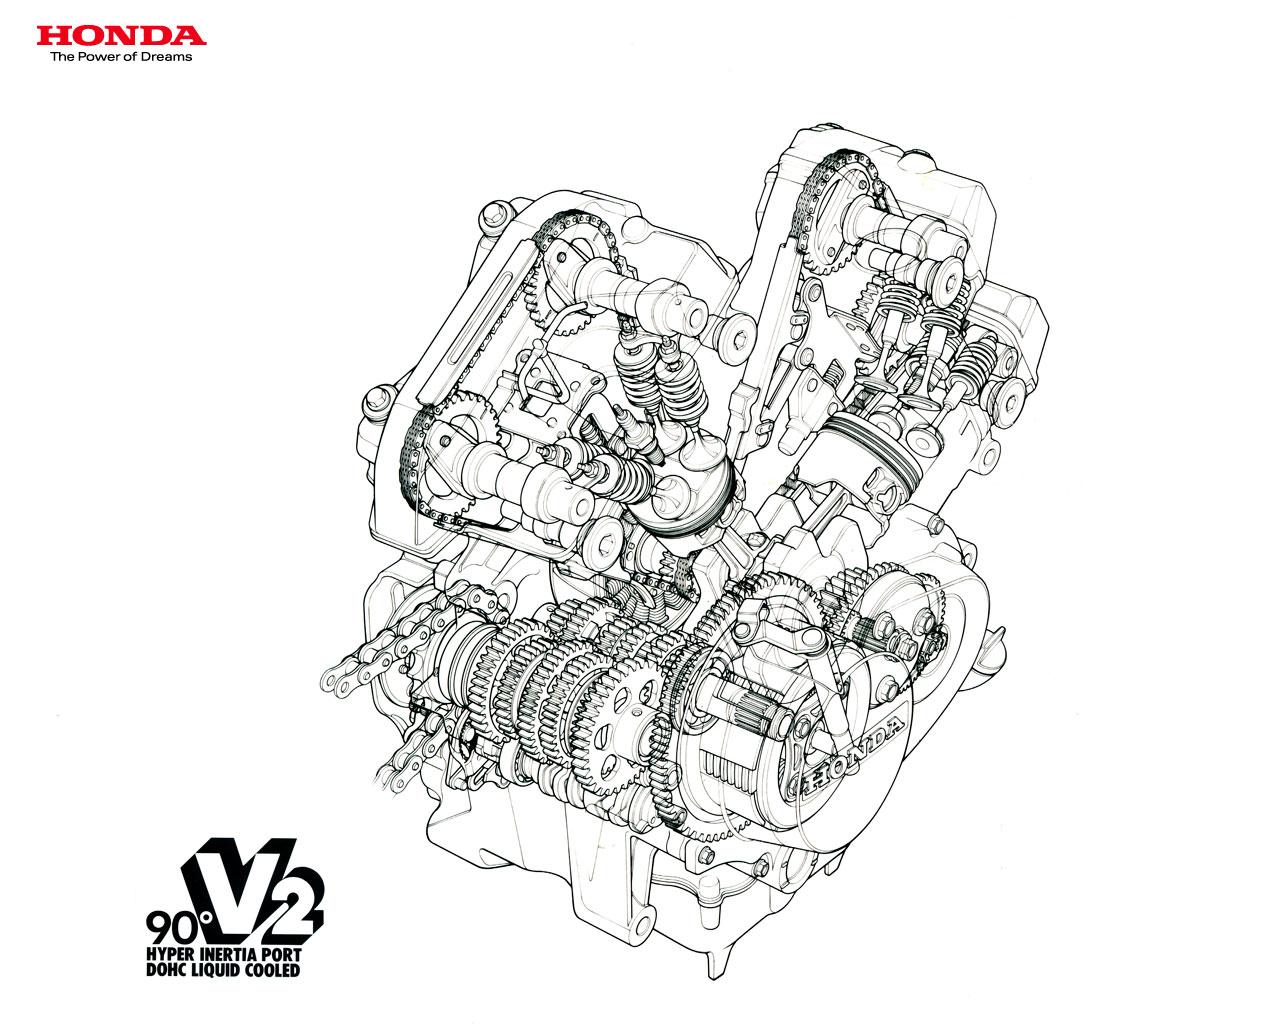 Racing Cafe Honda Vt 250 Cutaway